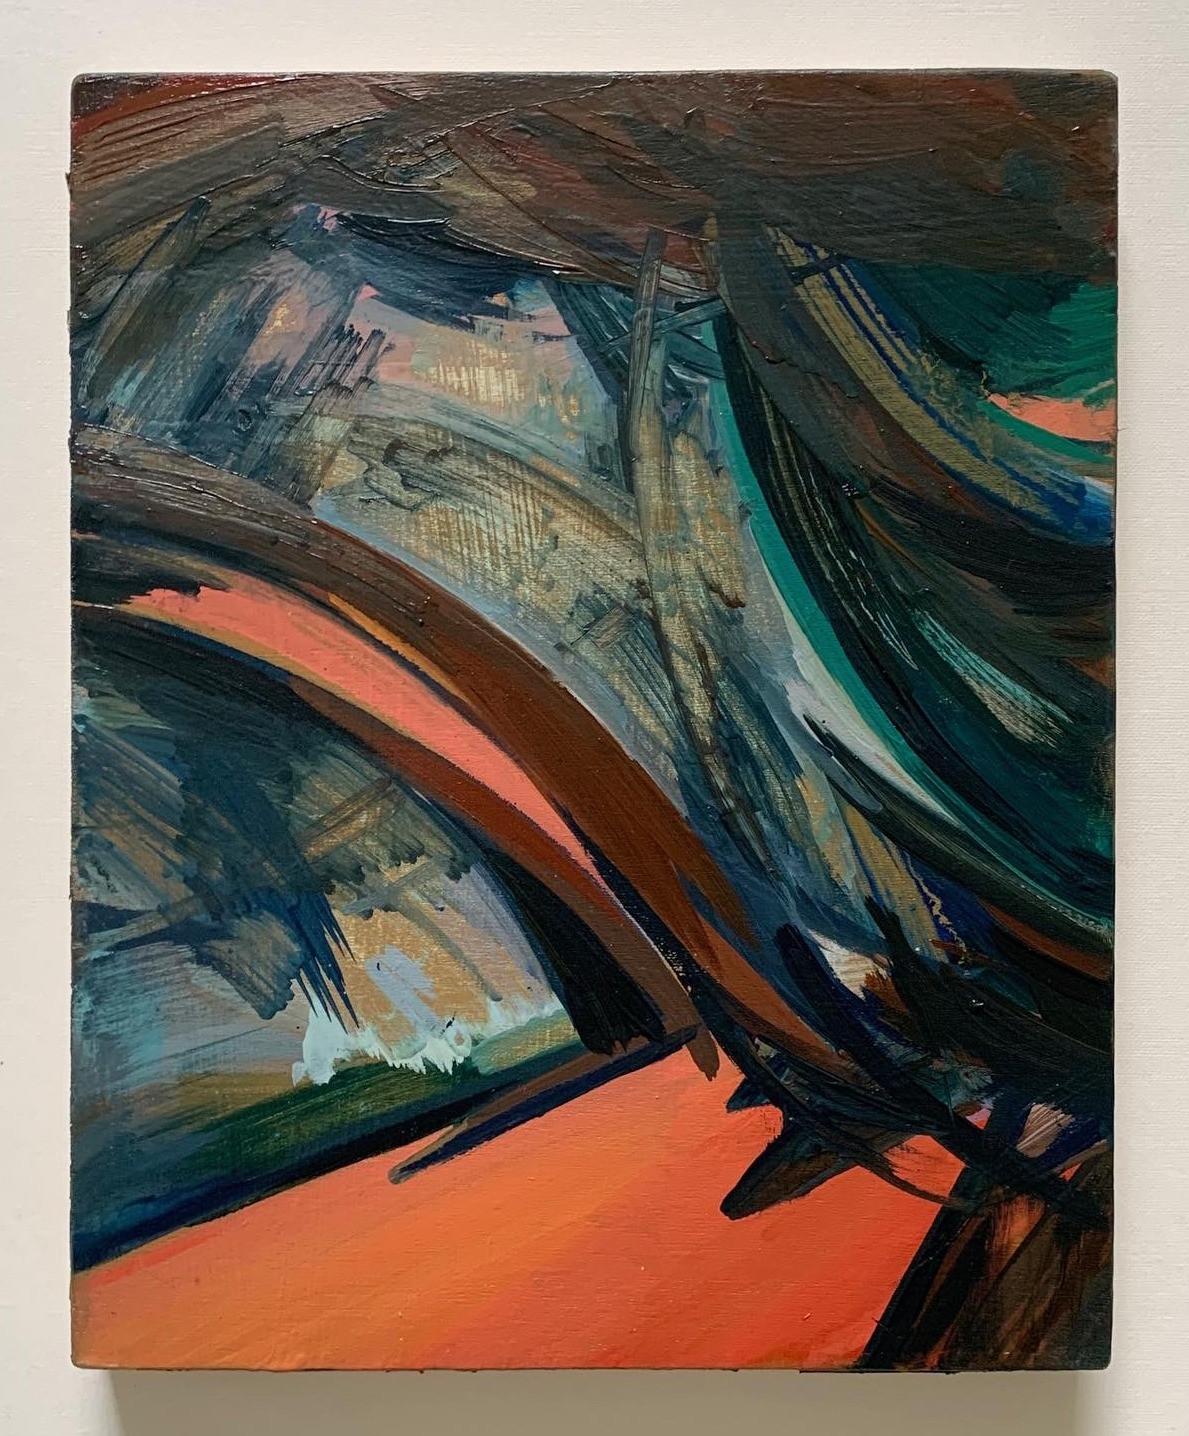 Untitled Oil on board 20x25cm 2020